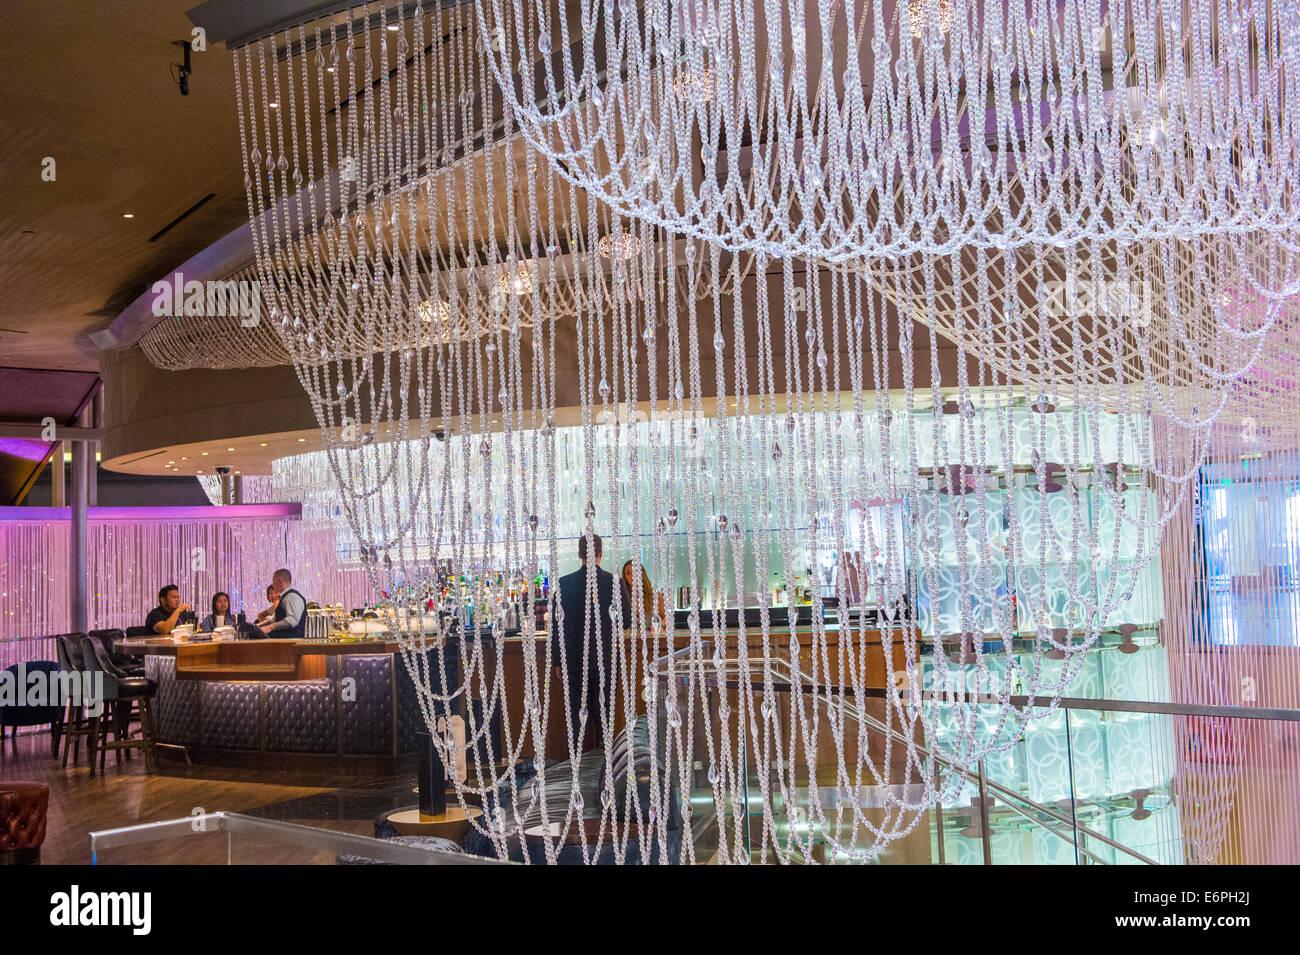 The Chandelier Bar at the Cosmopolitan Hotel & Casino in Las Vegas ...